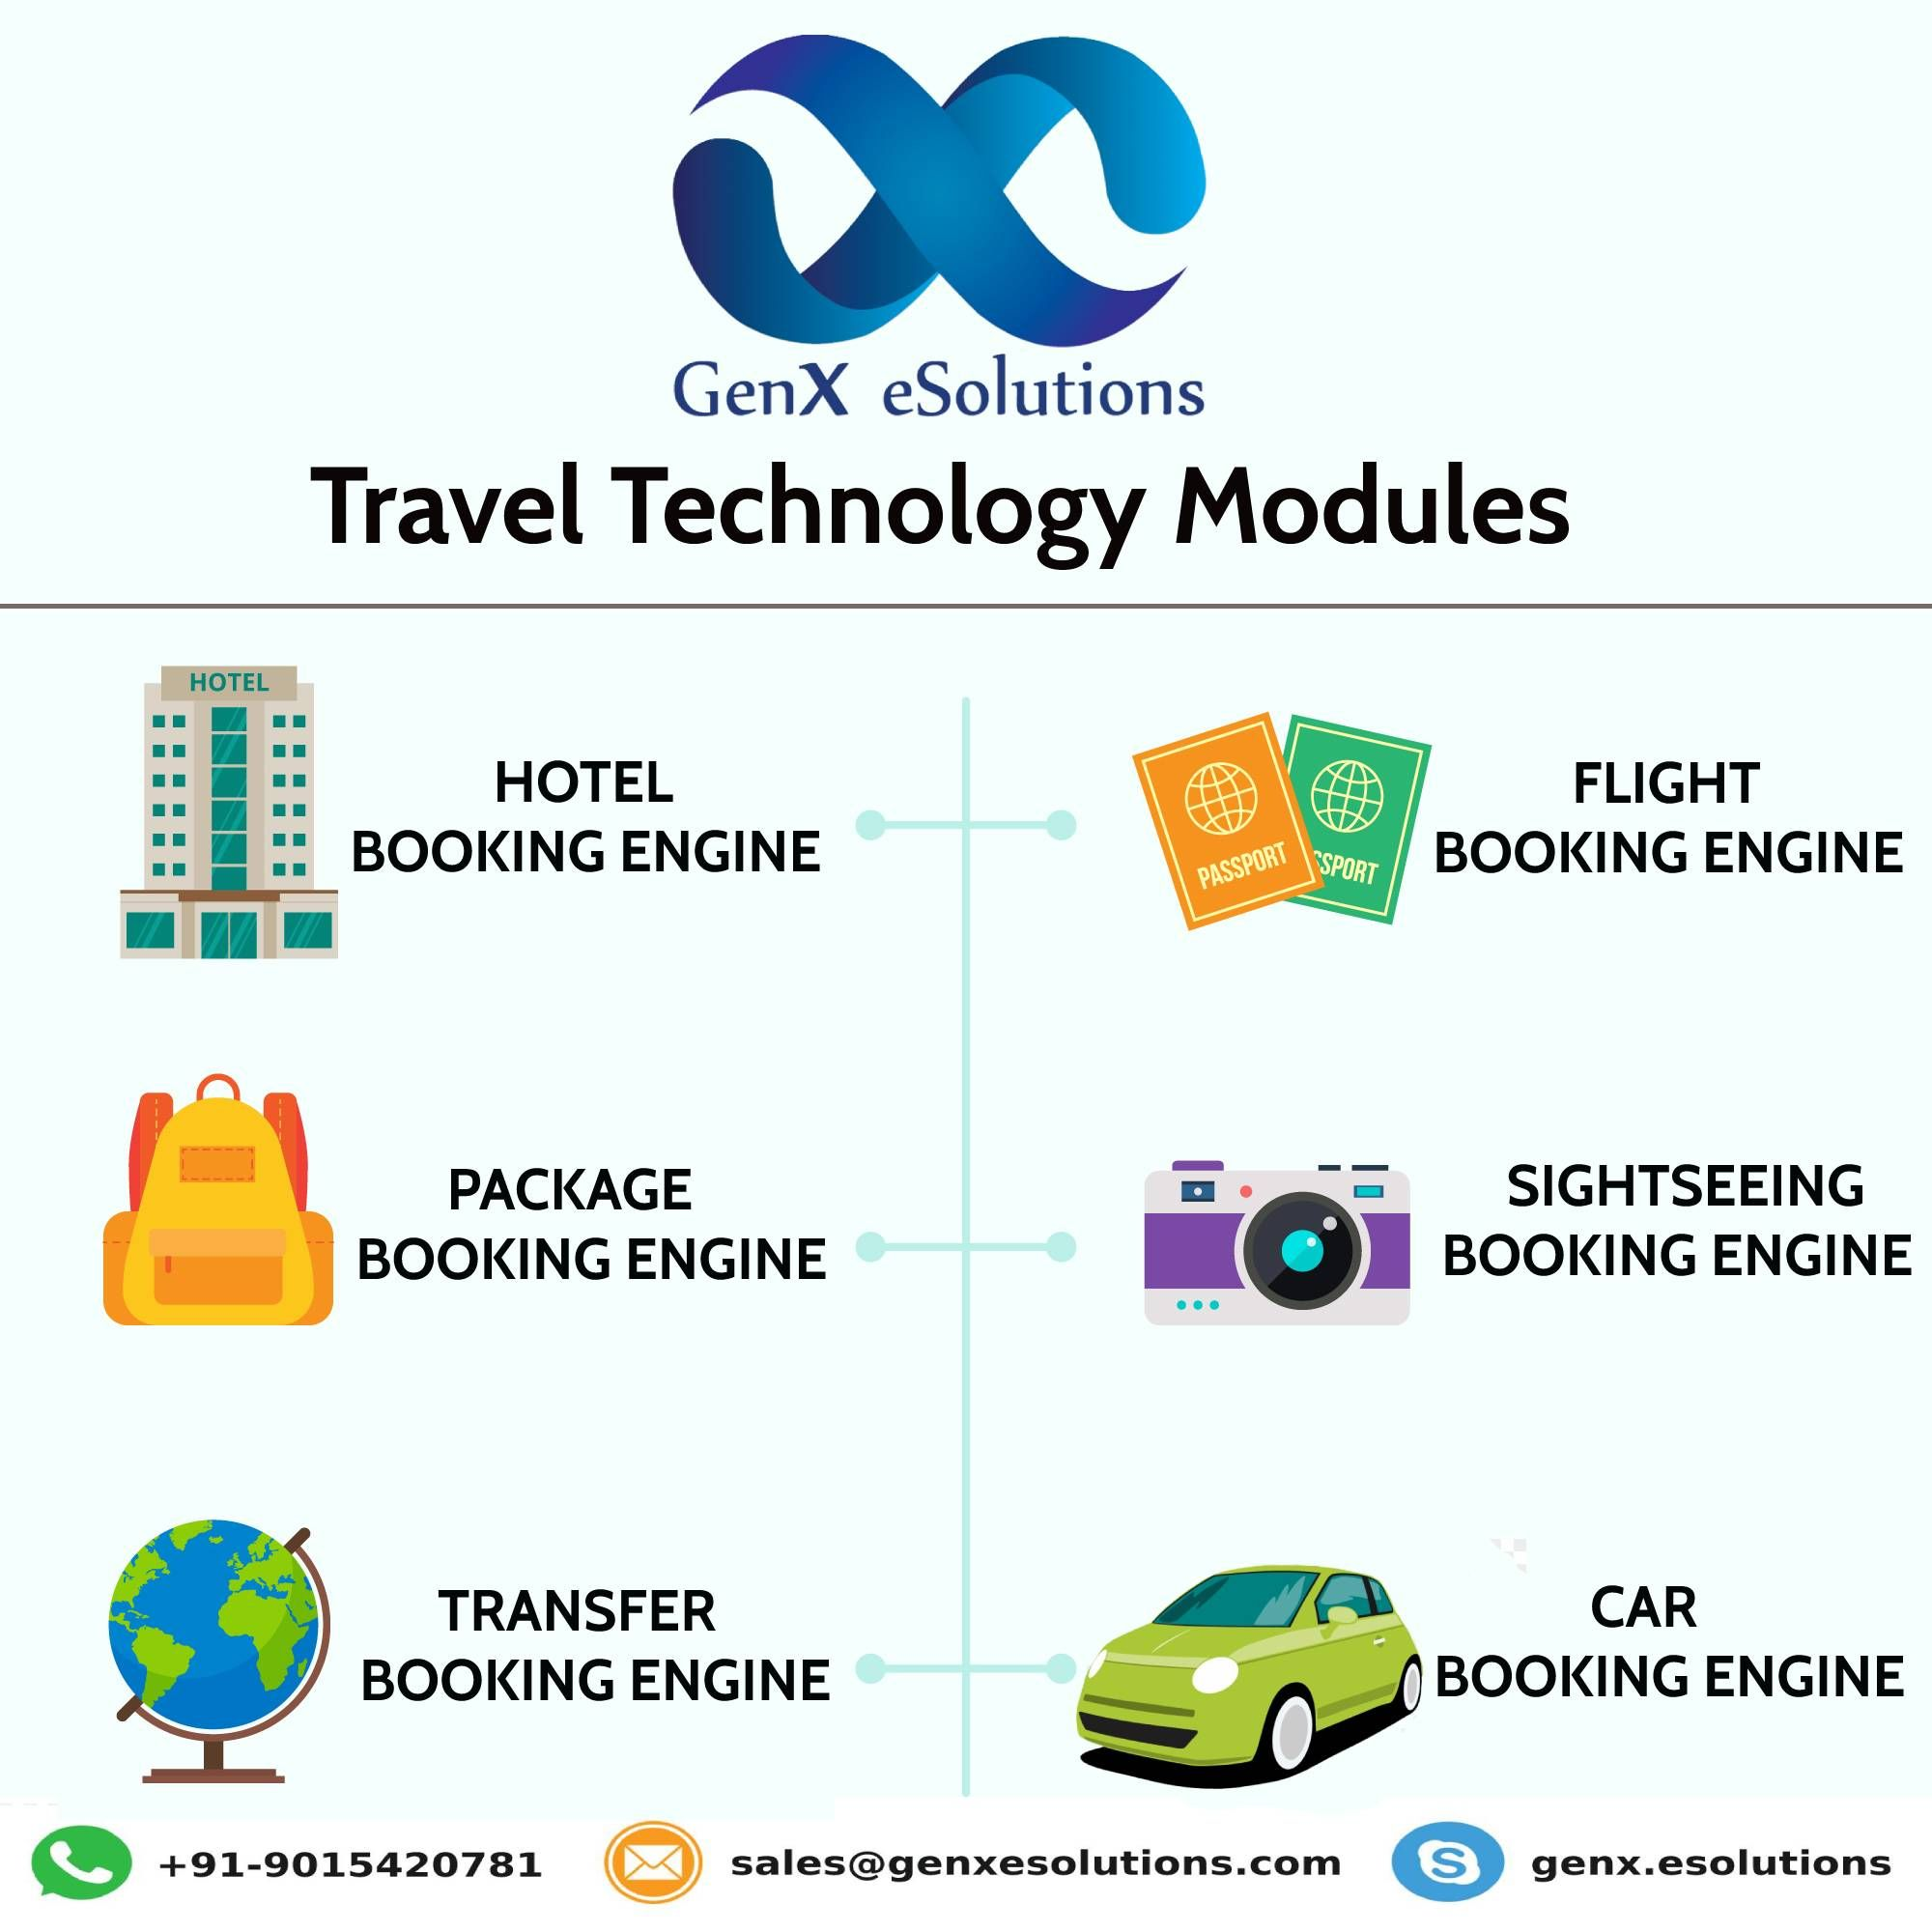 GenX eSolutions Travel Technology Company has pre